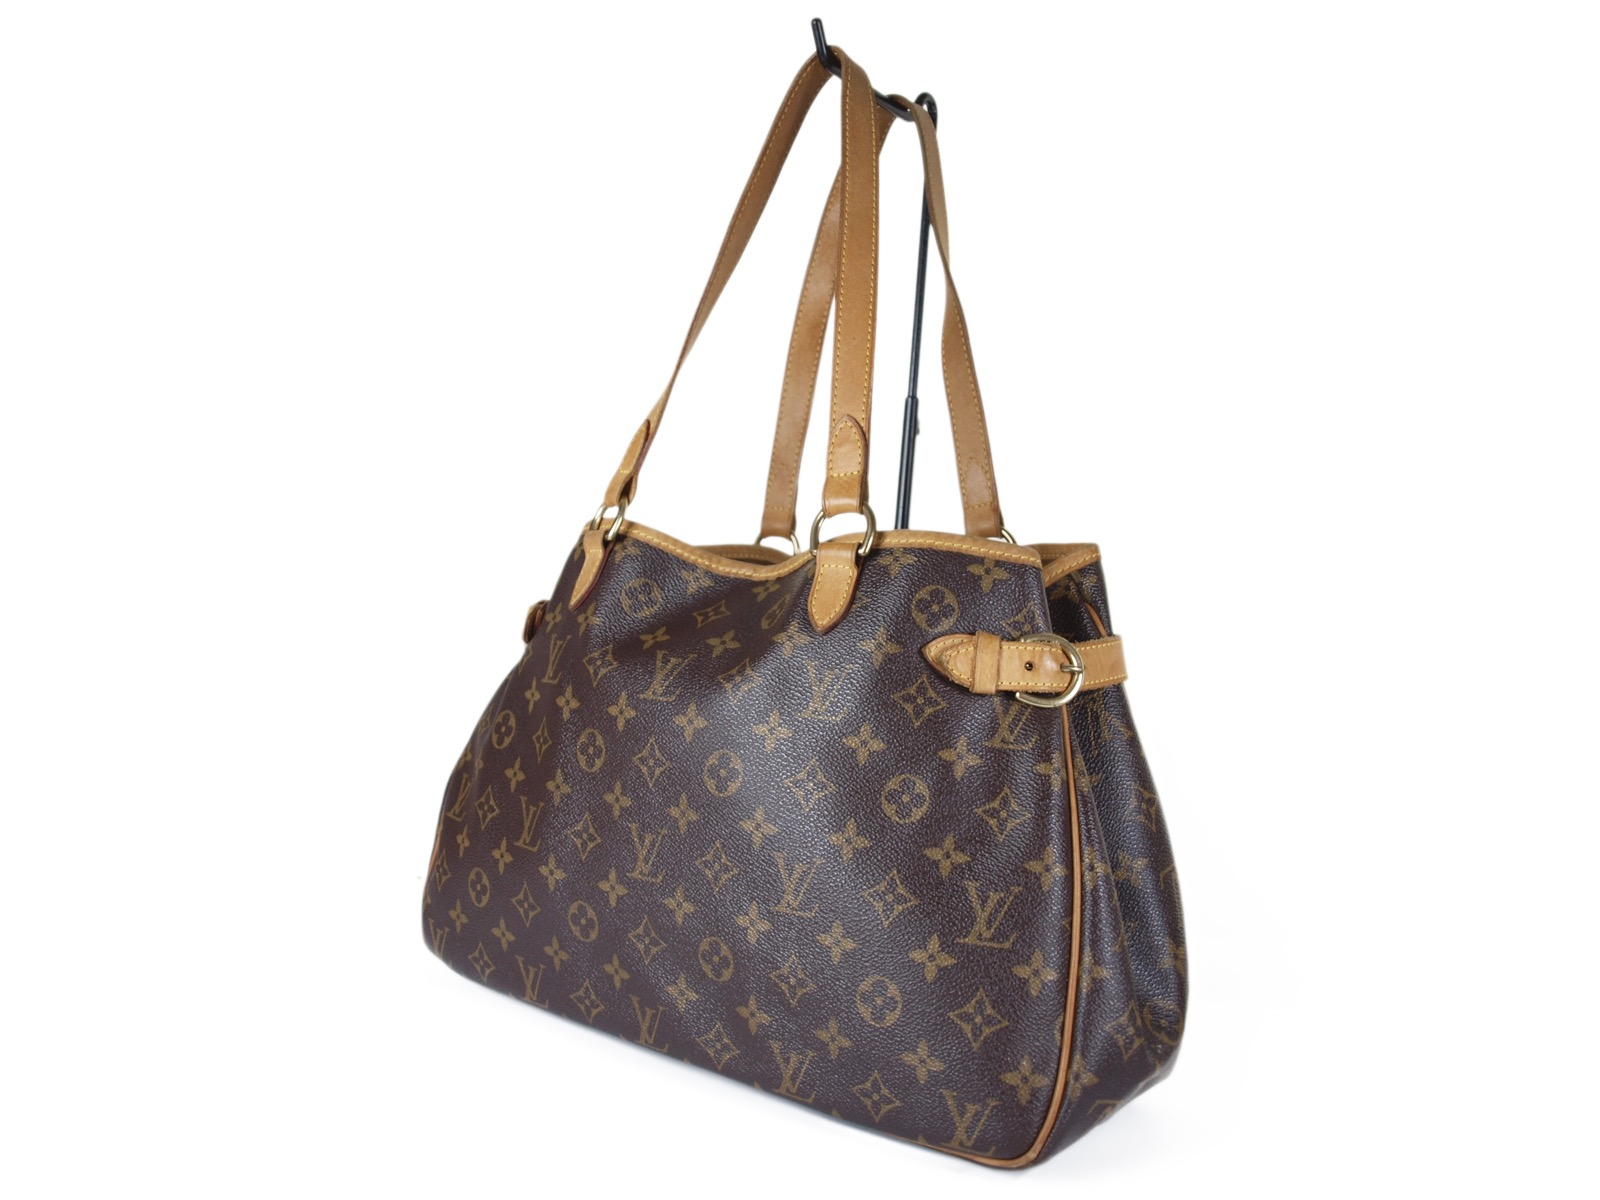 -Louis Vuitton- 贈物 ルイヴィトン Batignolles Horizontal Monogram バティニョール モノグラム オリゾンタル ショルダーバッグ 中古 返品不可